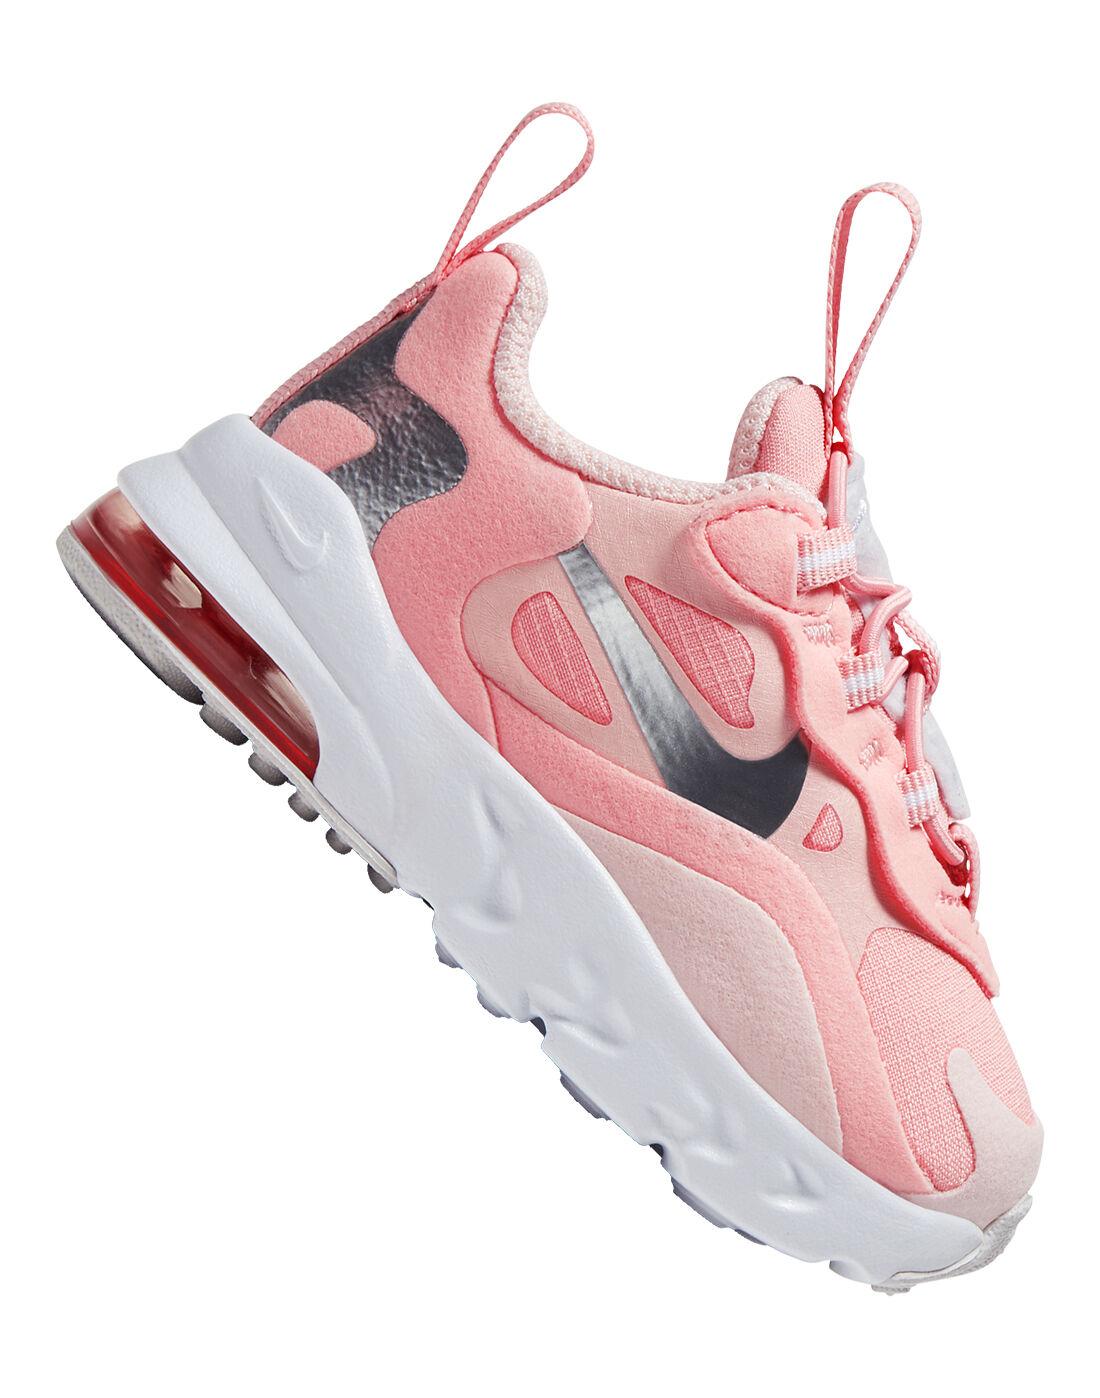 nike air max 270 react - baby shoes